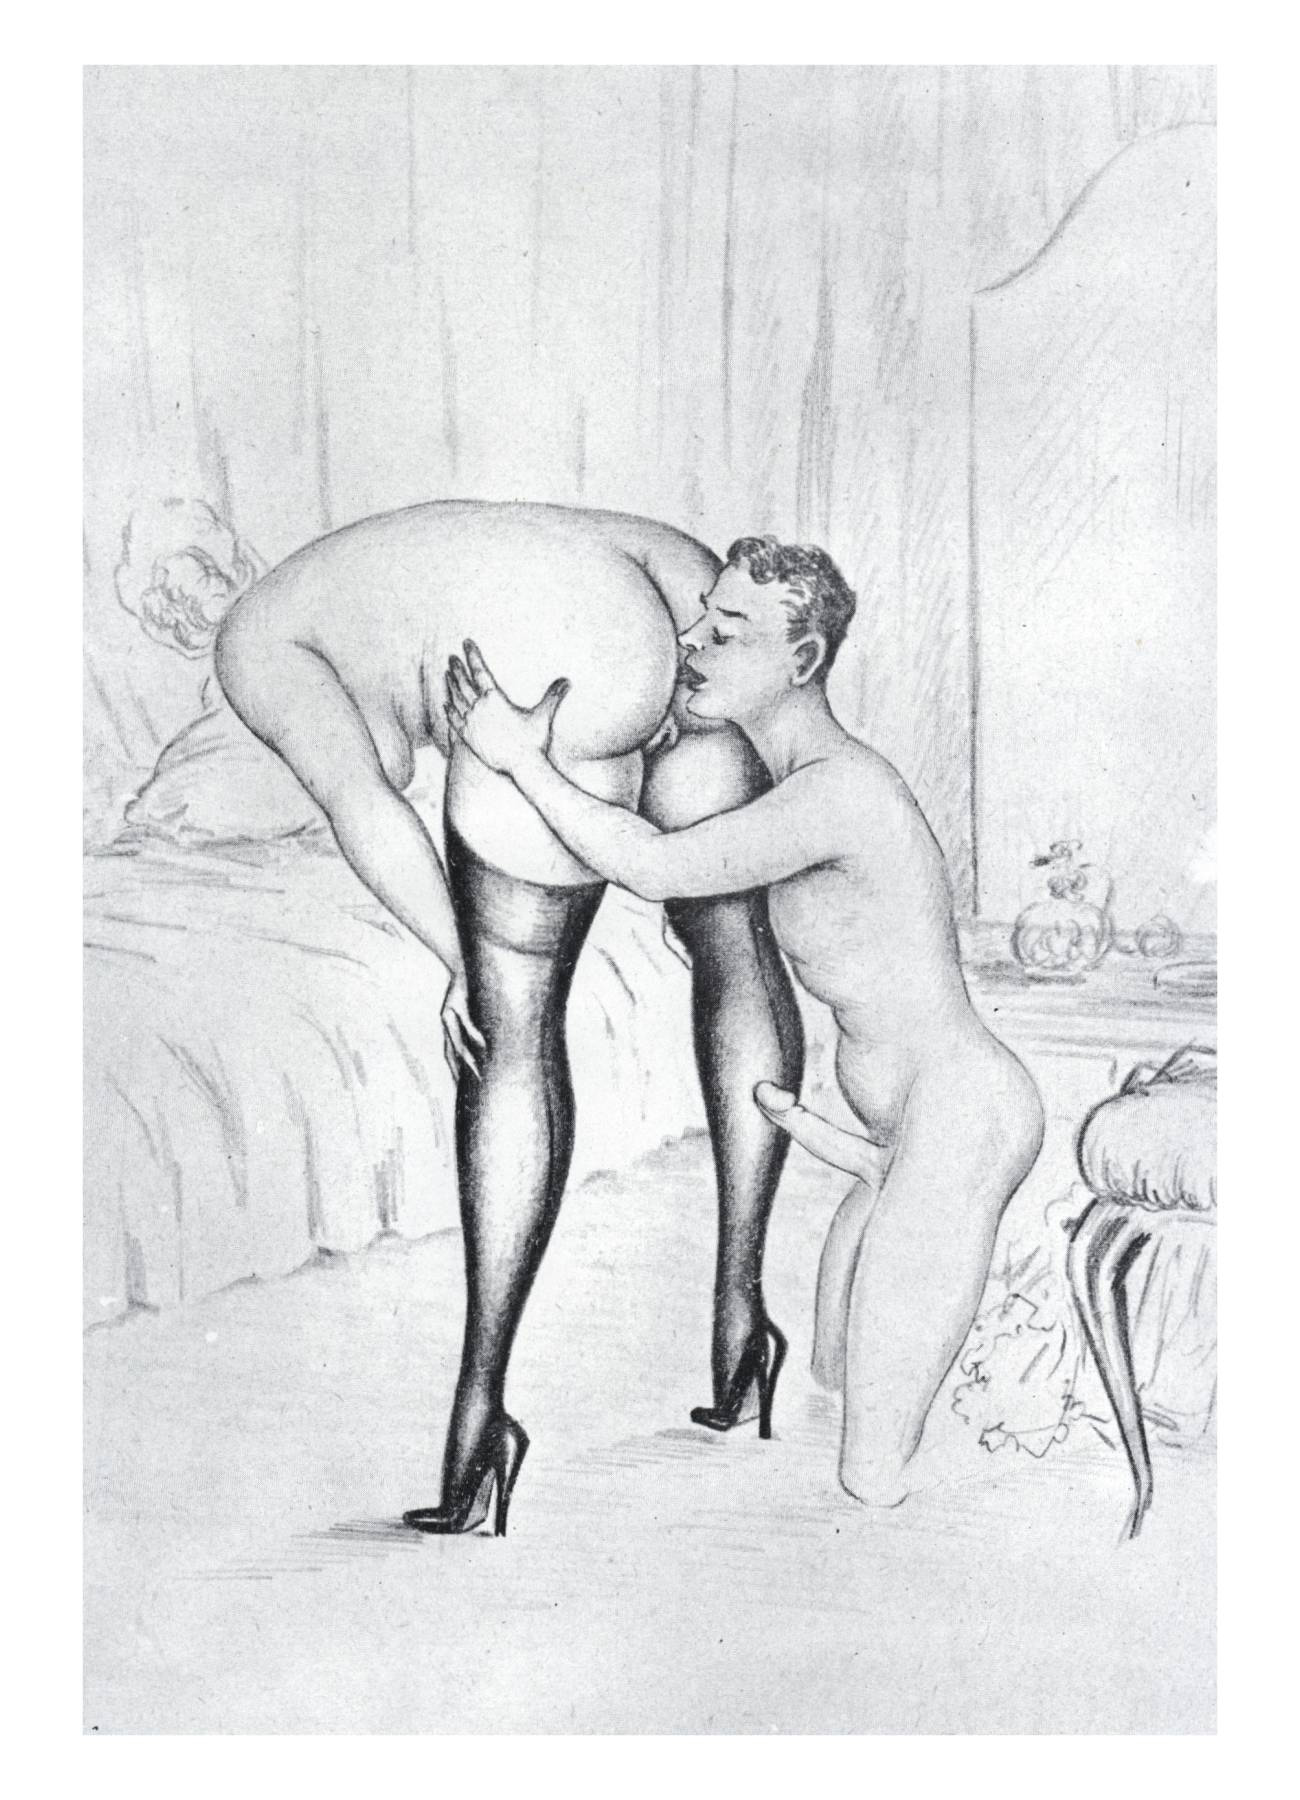 retro-porno-risunki-karandashom